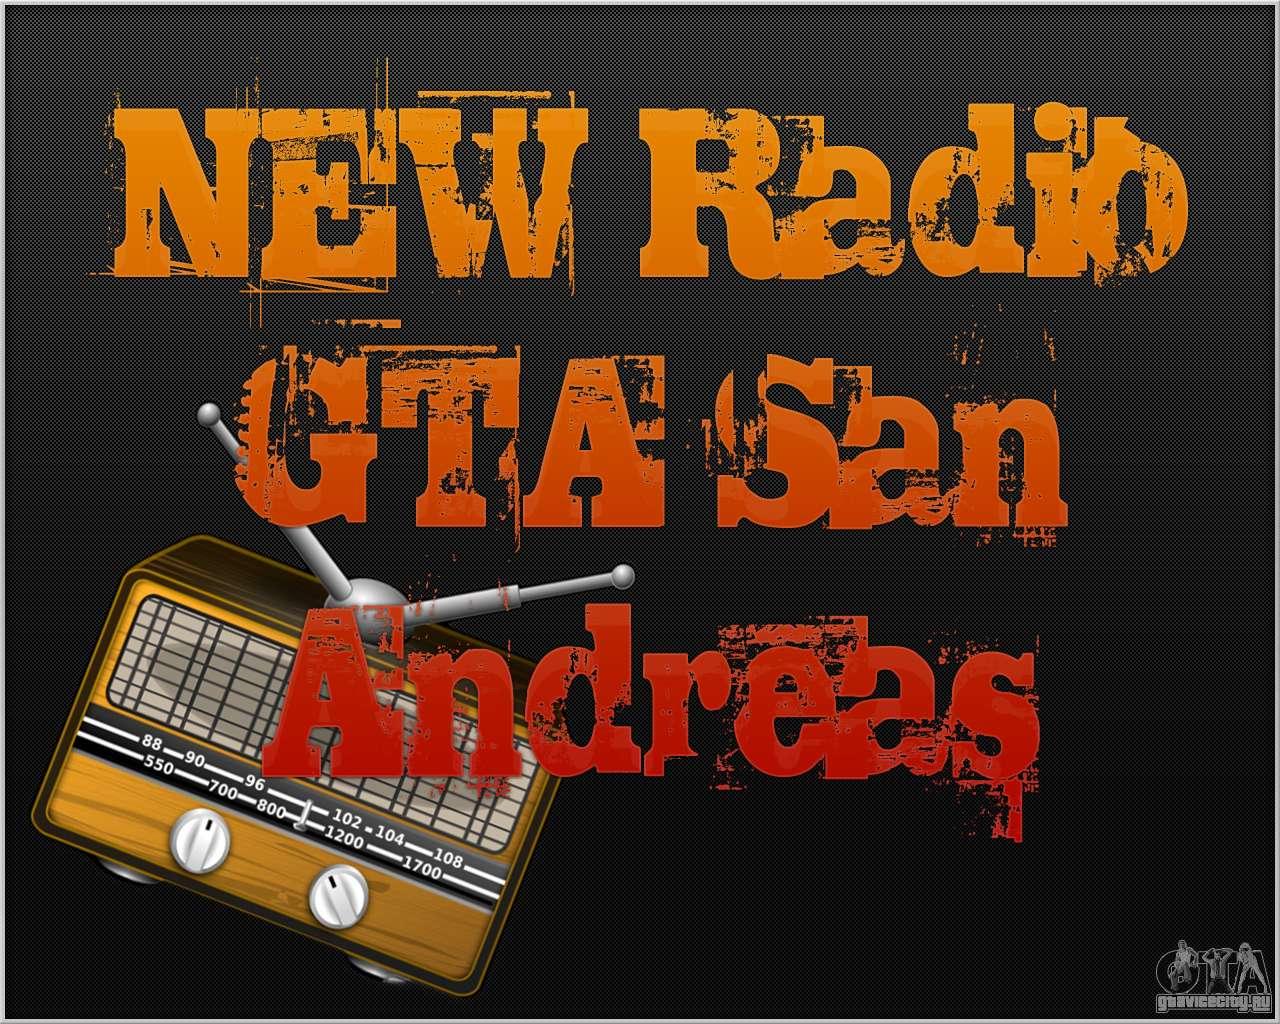 Gta san andreas gta v music/radio for android mod gtainside. Com.